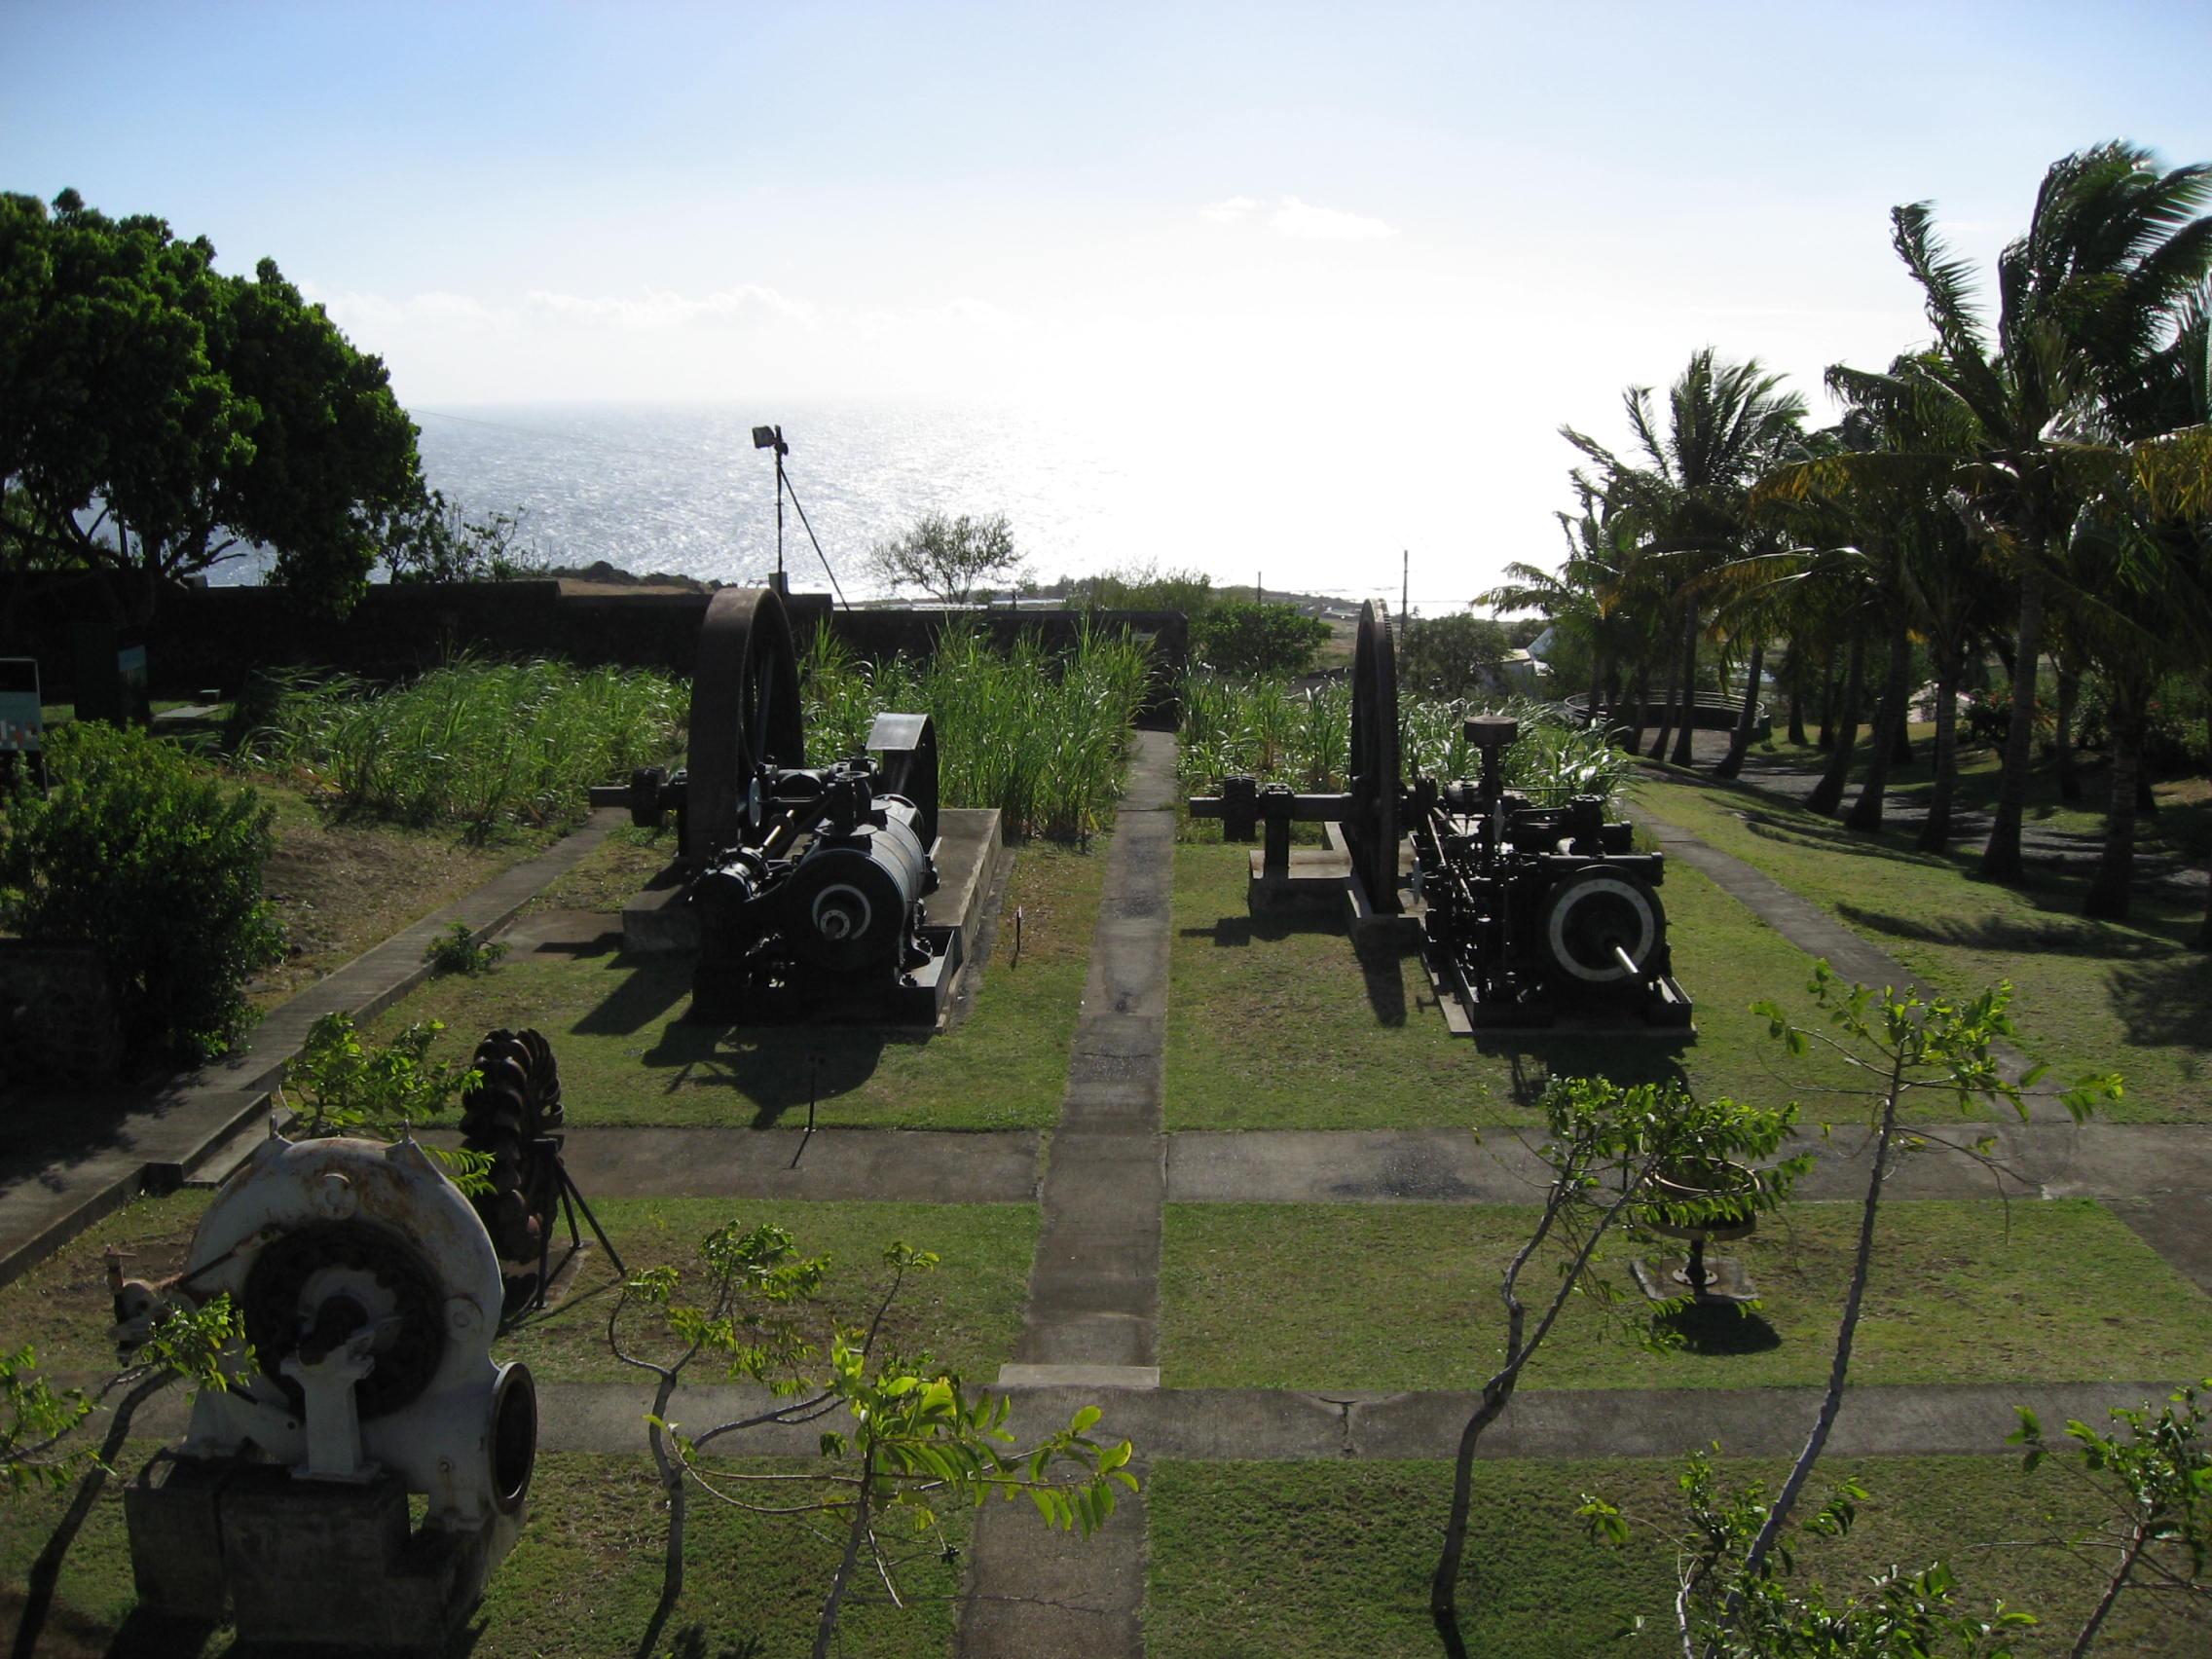 Les Outils De Jardinage Avec Photos file:fr reunion musee-stella-matutina vue-jardin-machine